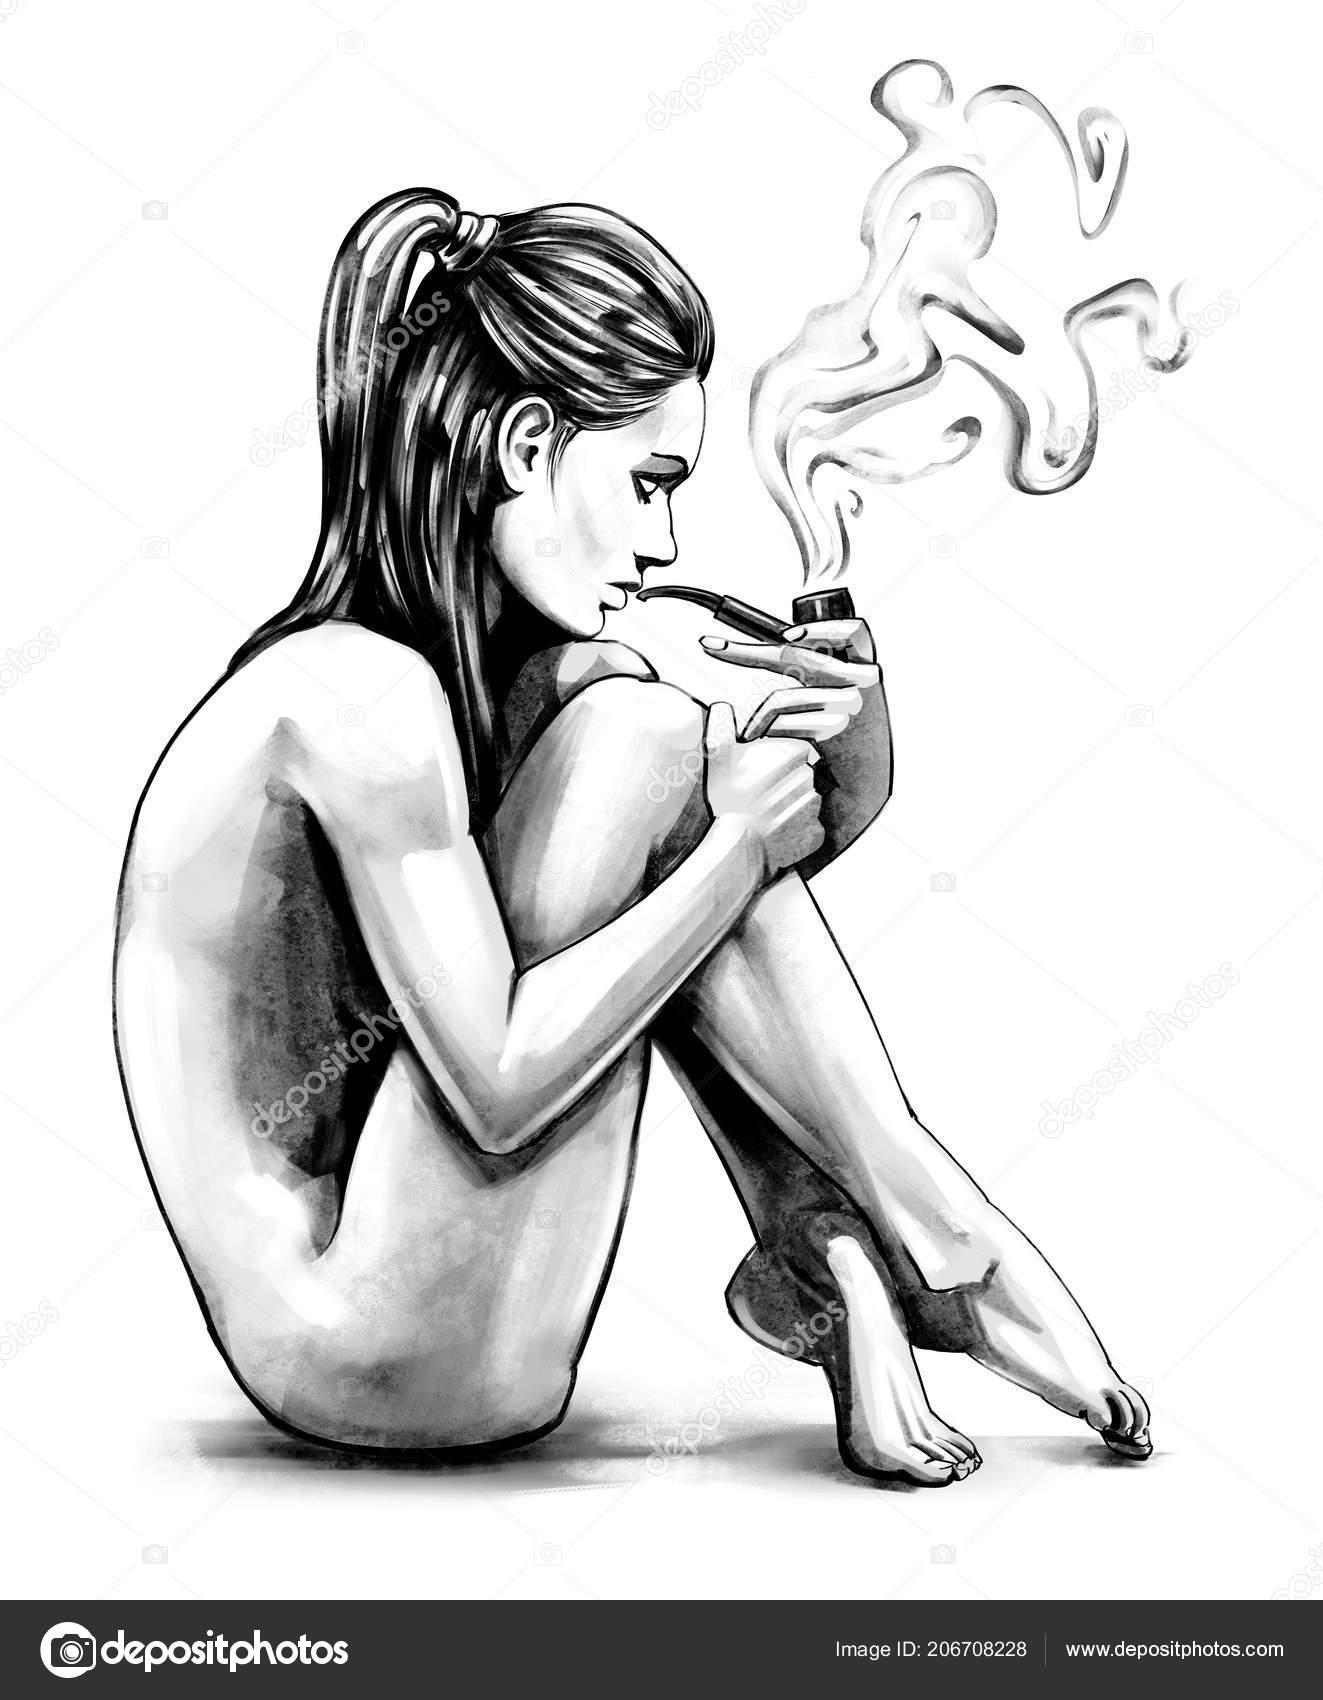 hot girl nahé obrázkychlapec a maminka sex photo